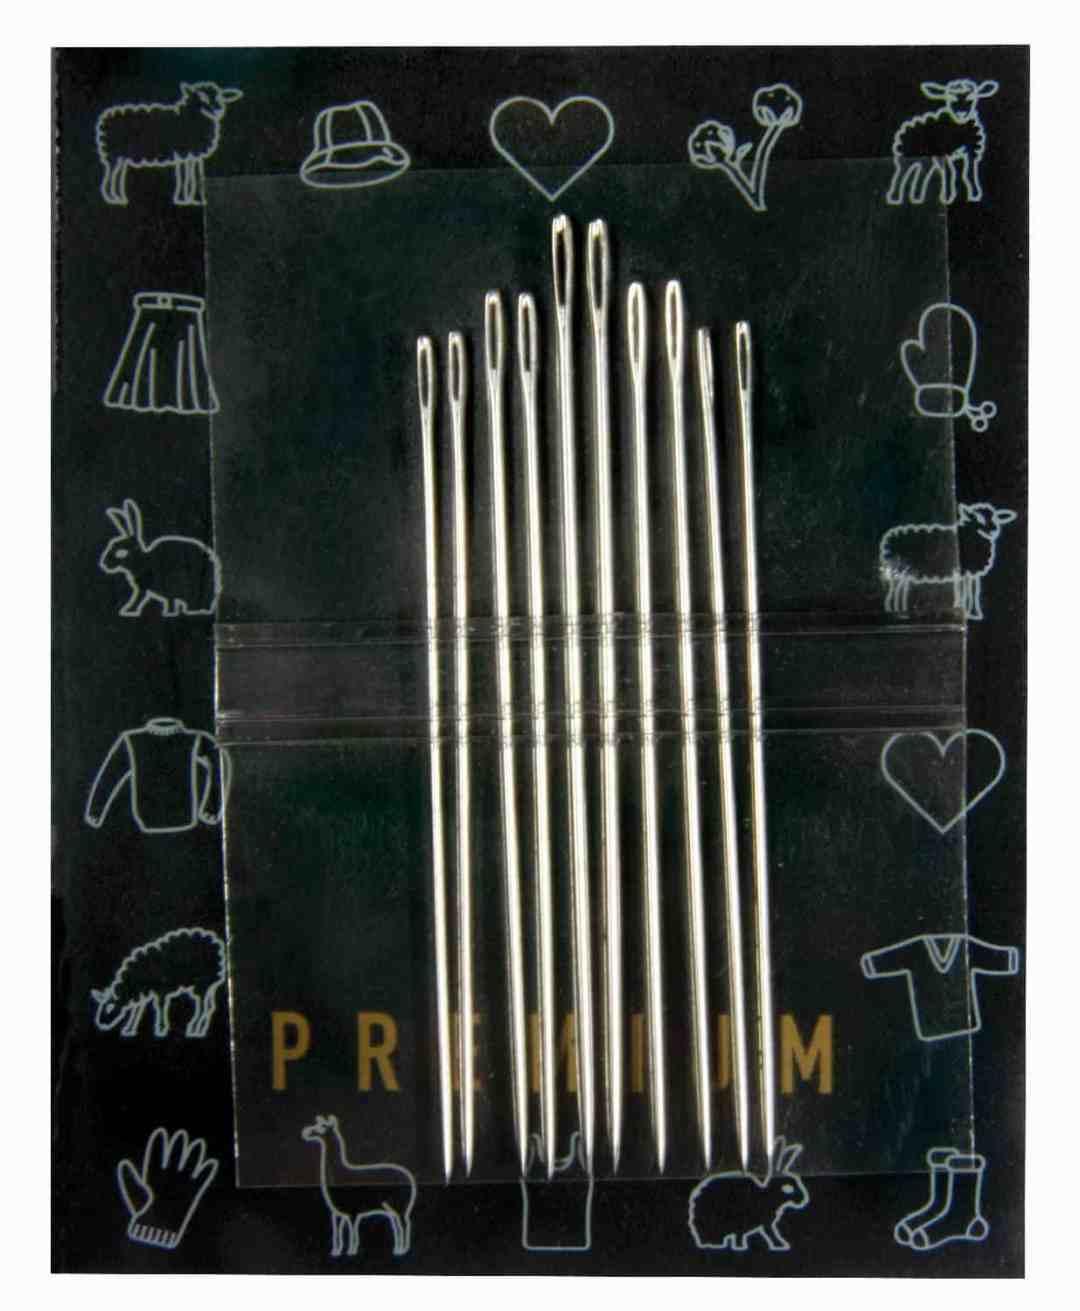 902-7 10 Assorted Darning Needles